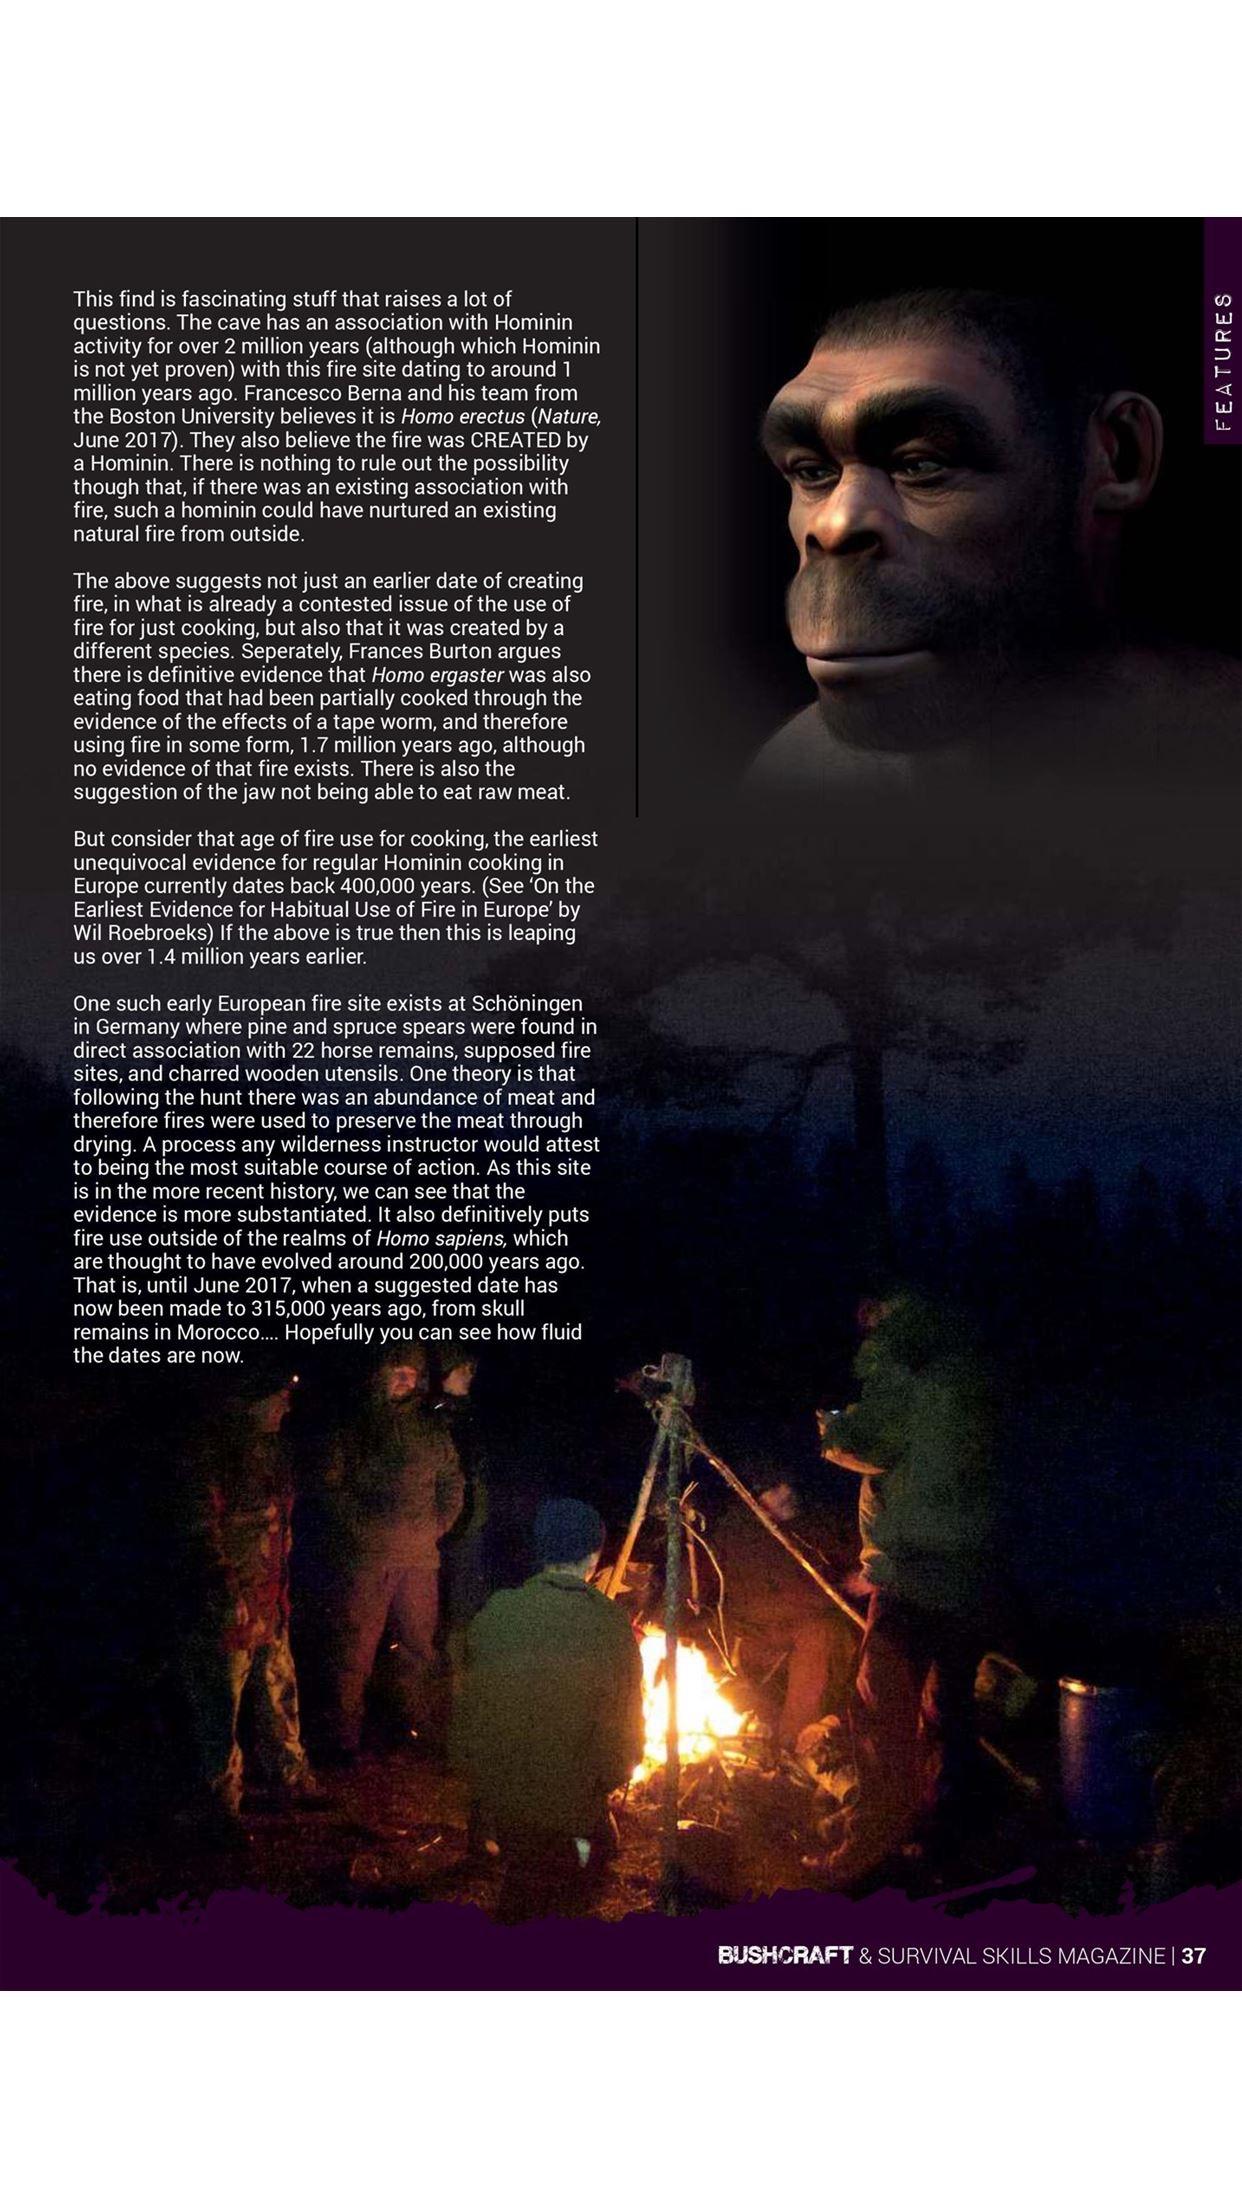 Bushcraft & Survival Skills Magazine - 'For living life outdoors…' Screenshot